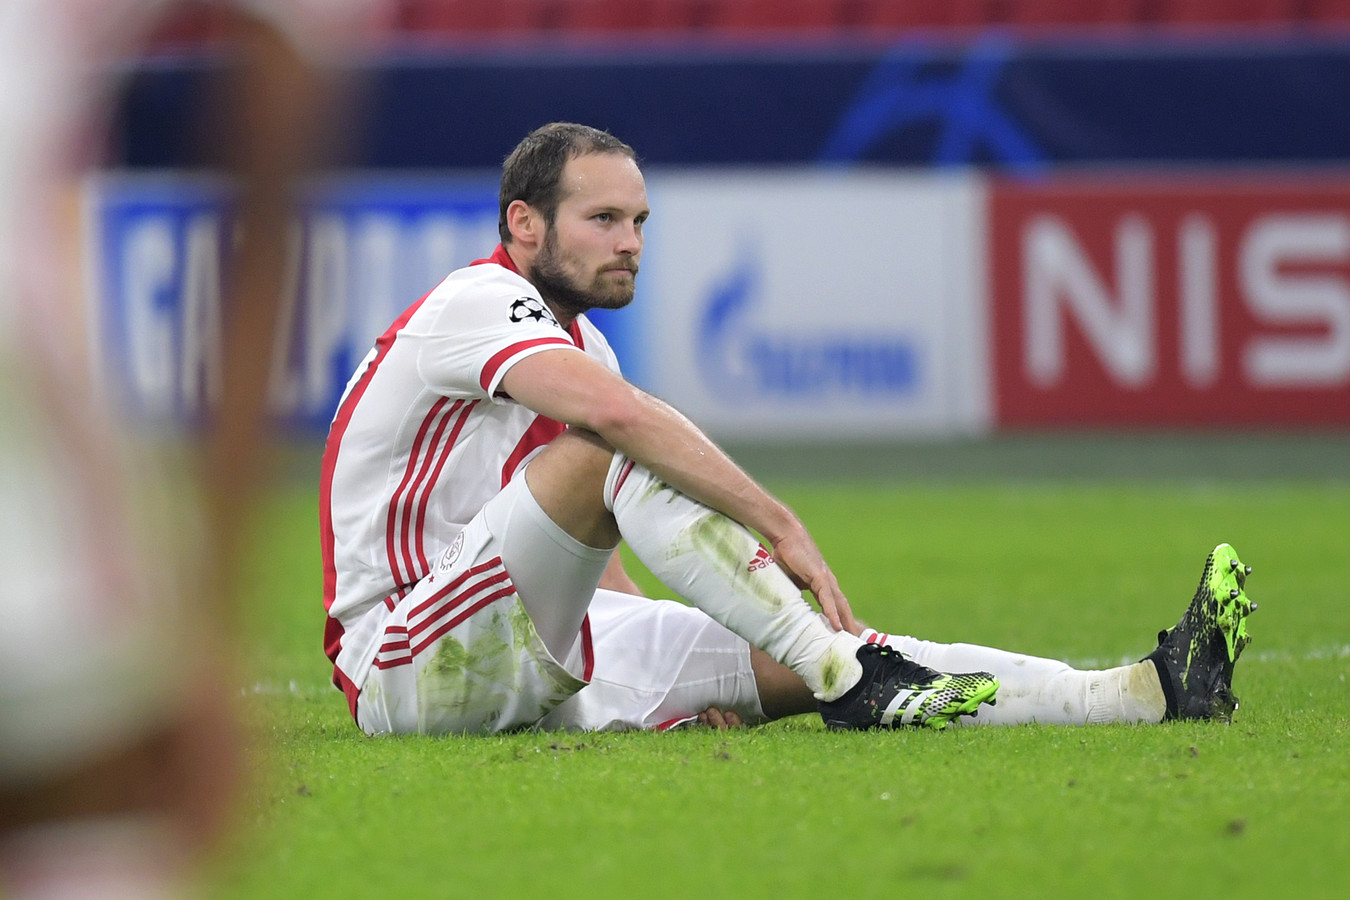 Daley Blind of Ajax